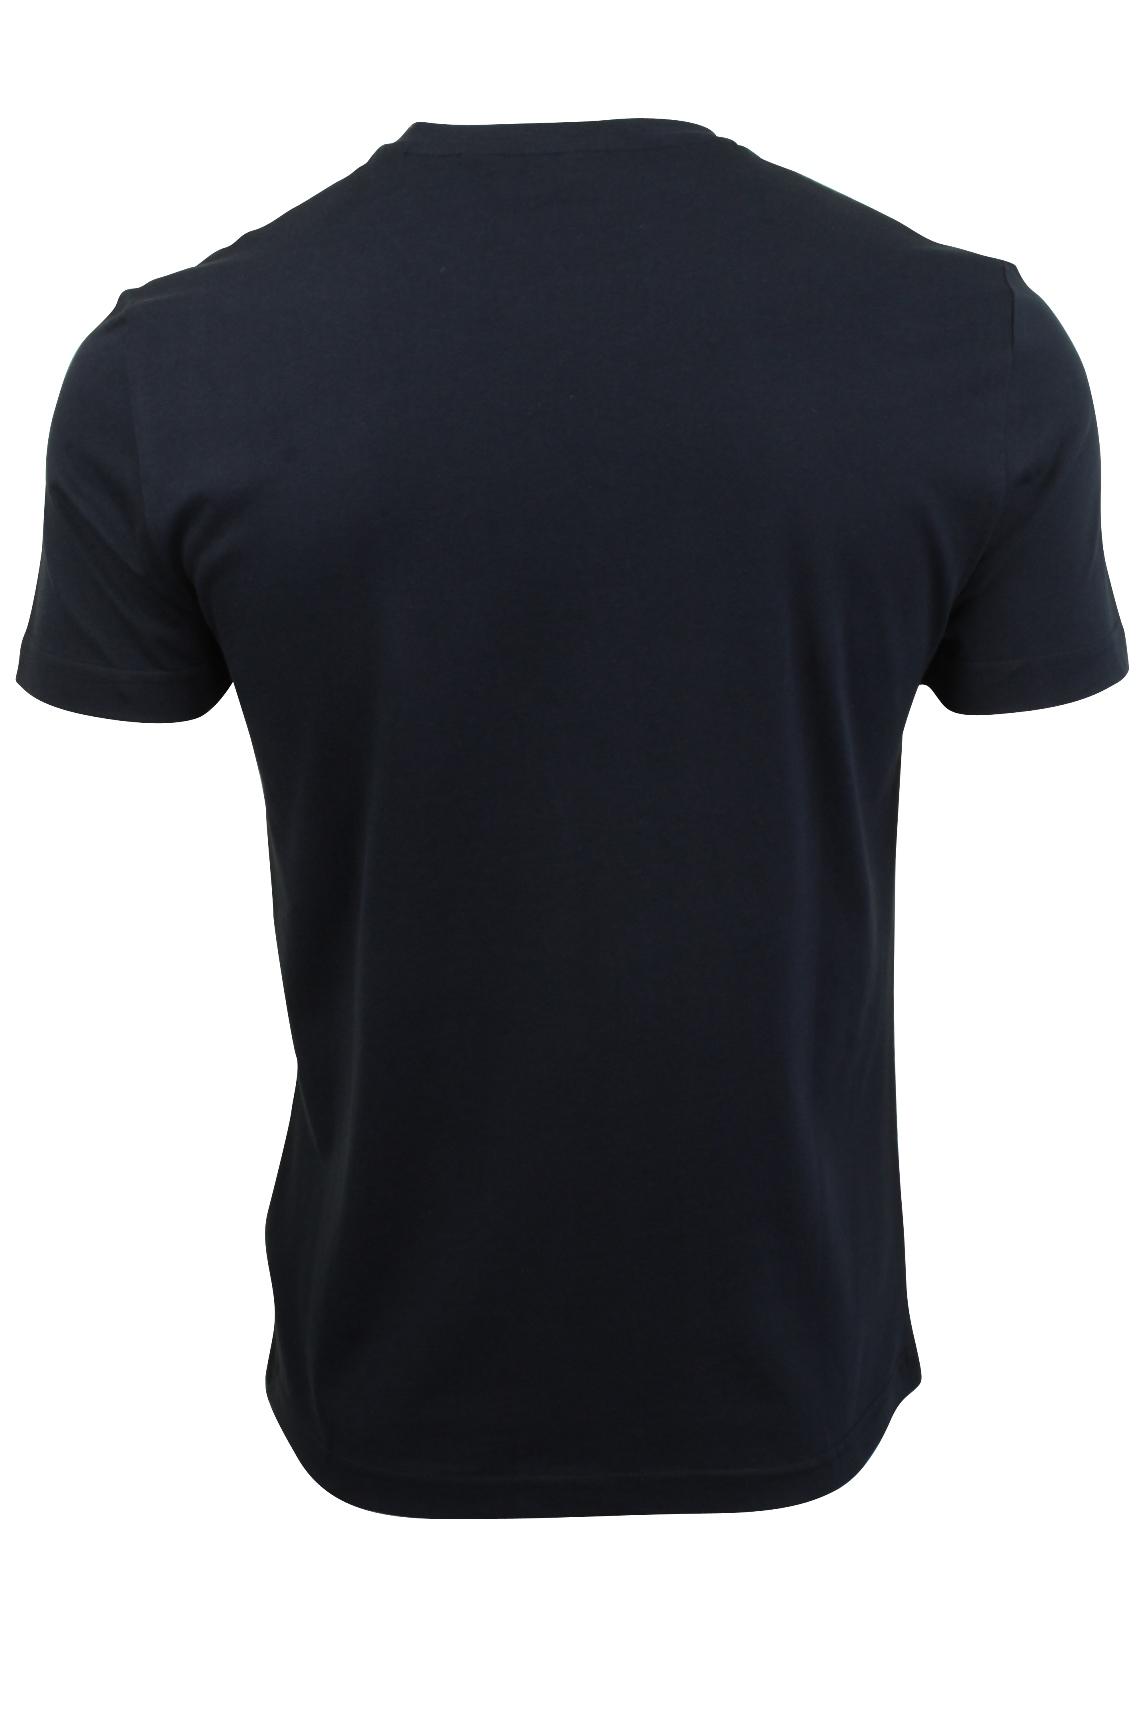 Mens-T-Shirt-by-Original-Penguin-Crew-Neck-Short-Sleeved thumbnail 17